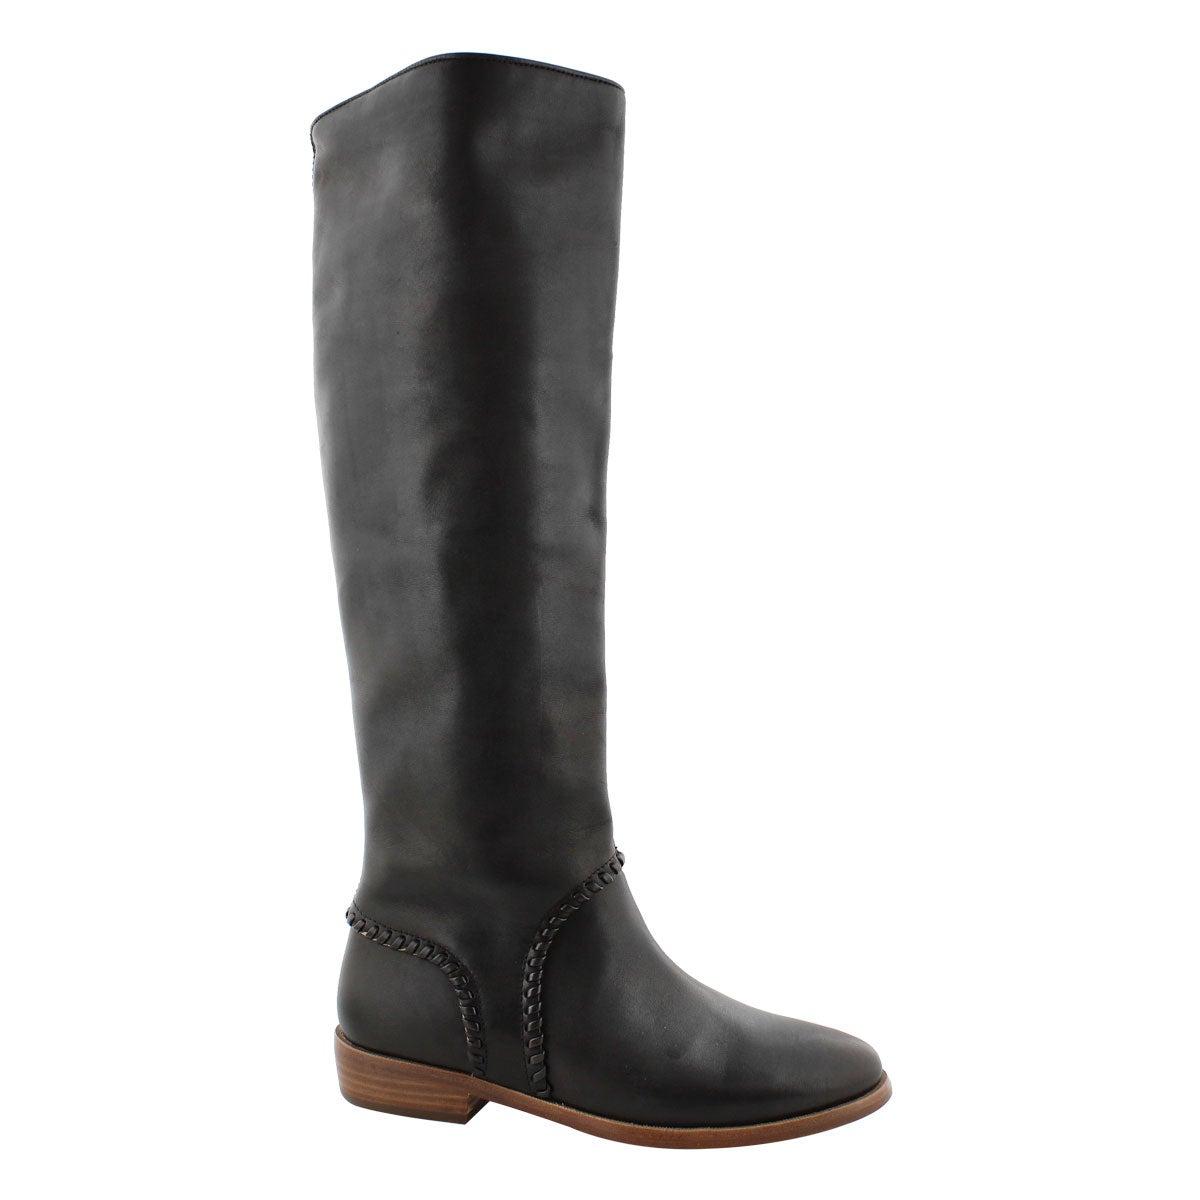 Lds Gracen Whipstitch black rain boot